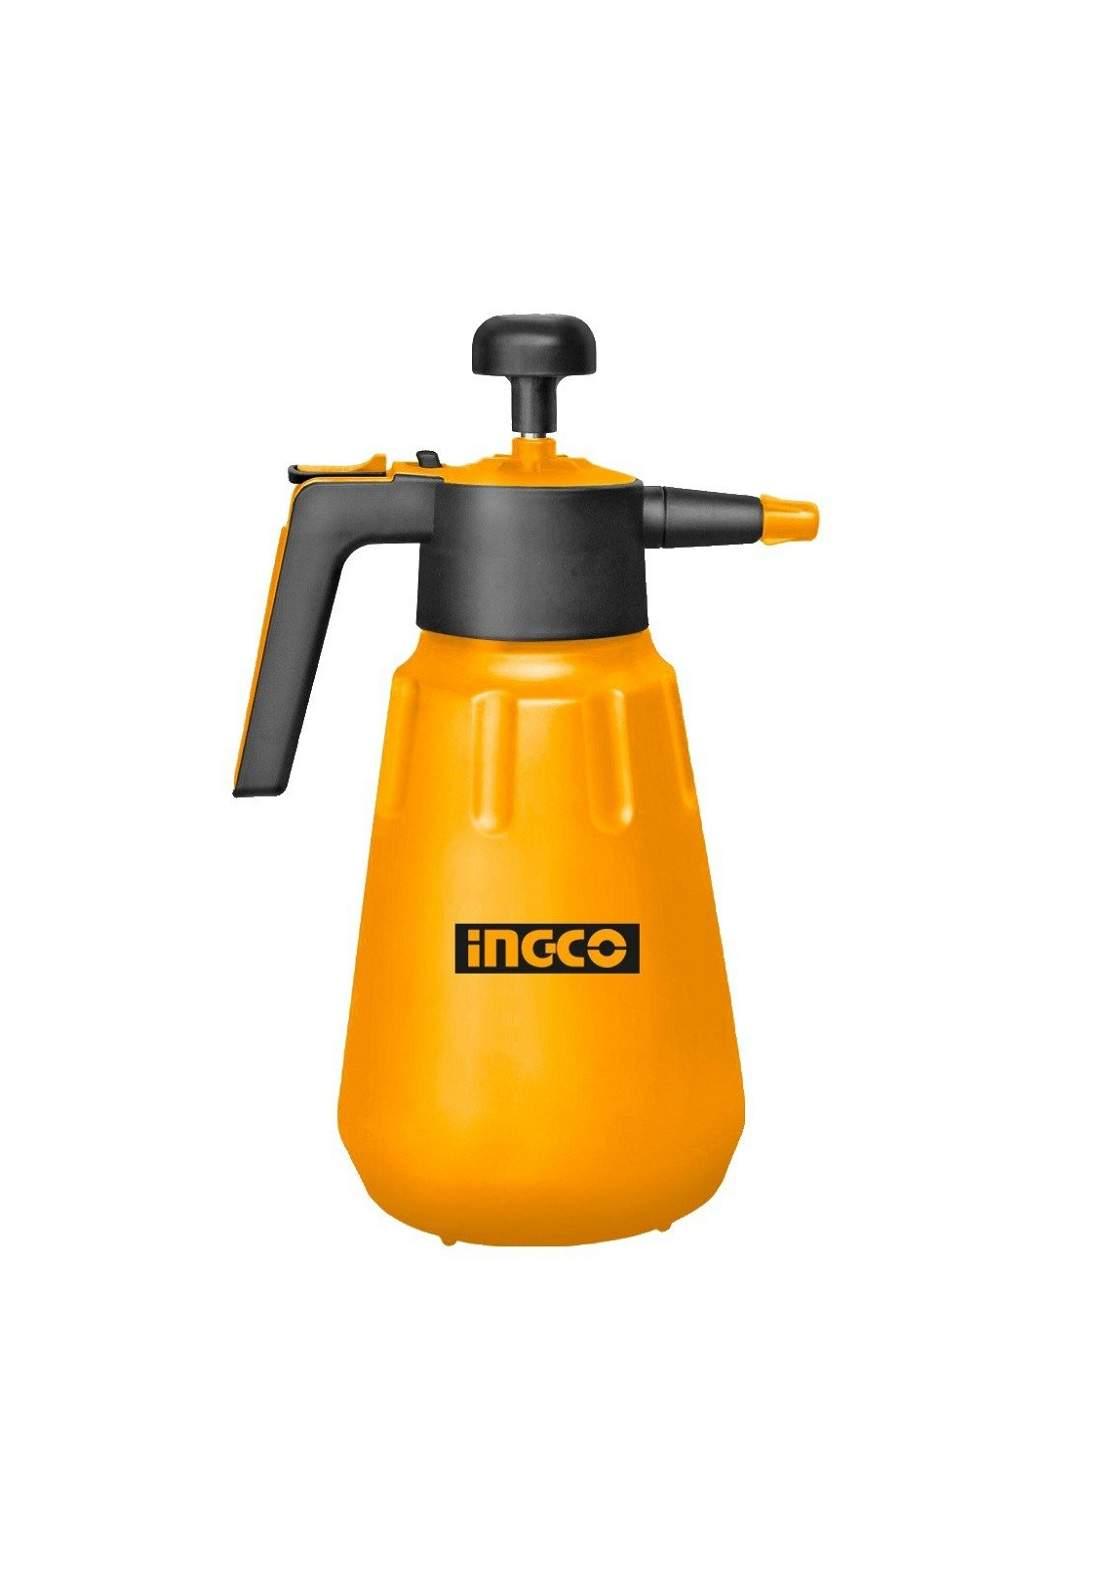 INGCO HSPP2021 Pressure Garden Sprayer بخاخ مرش مبيدات زراعية